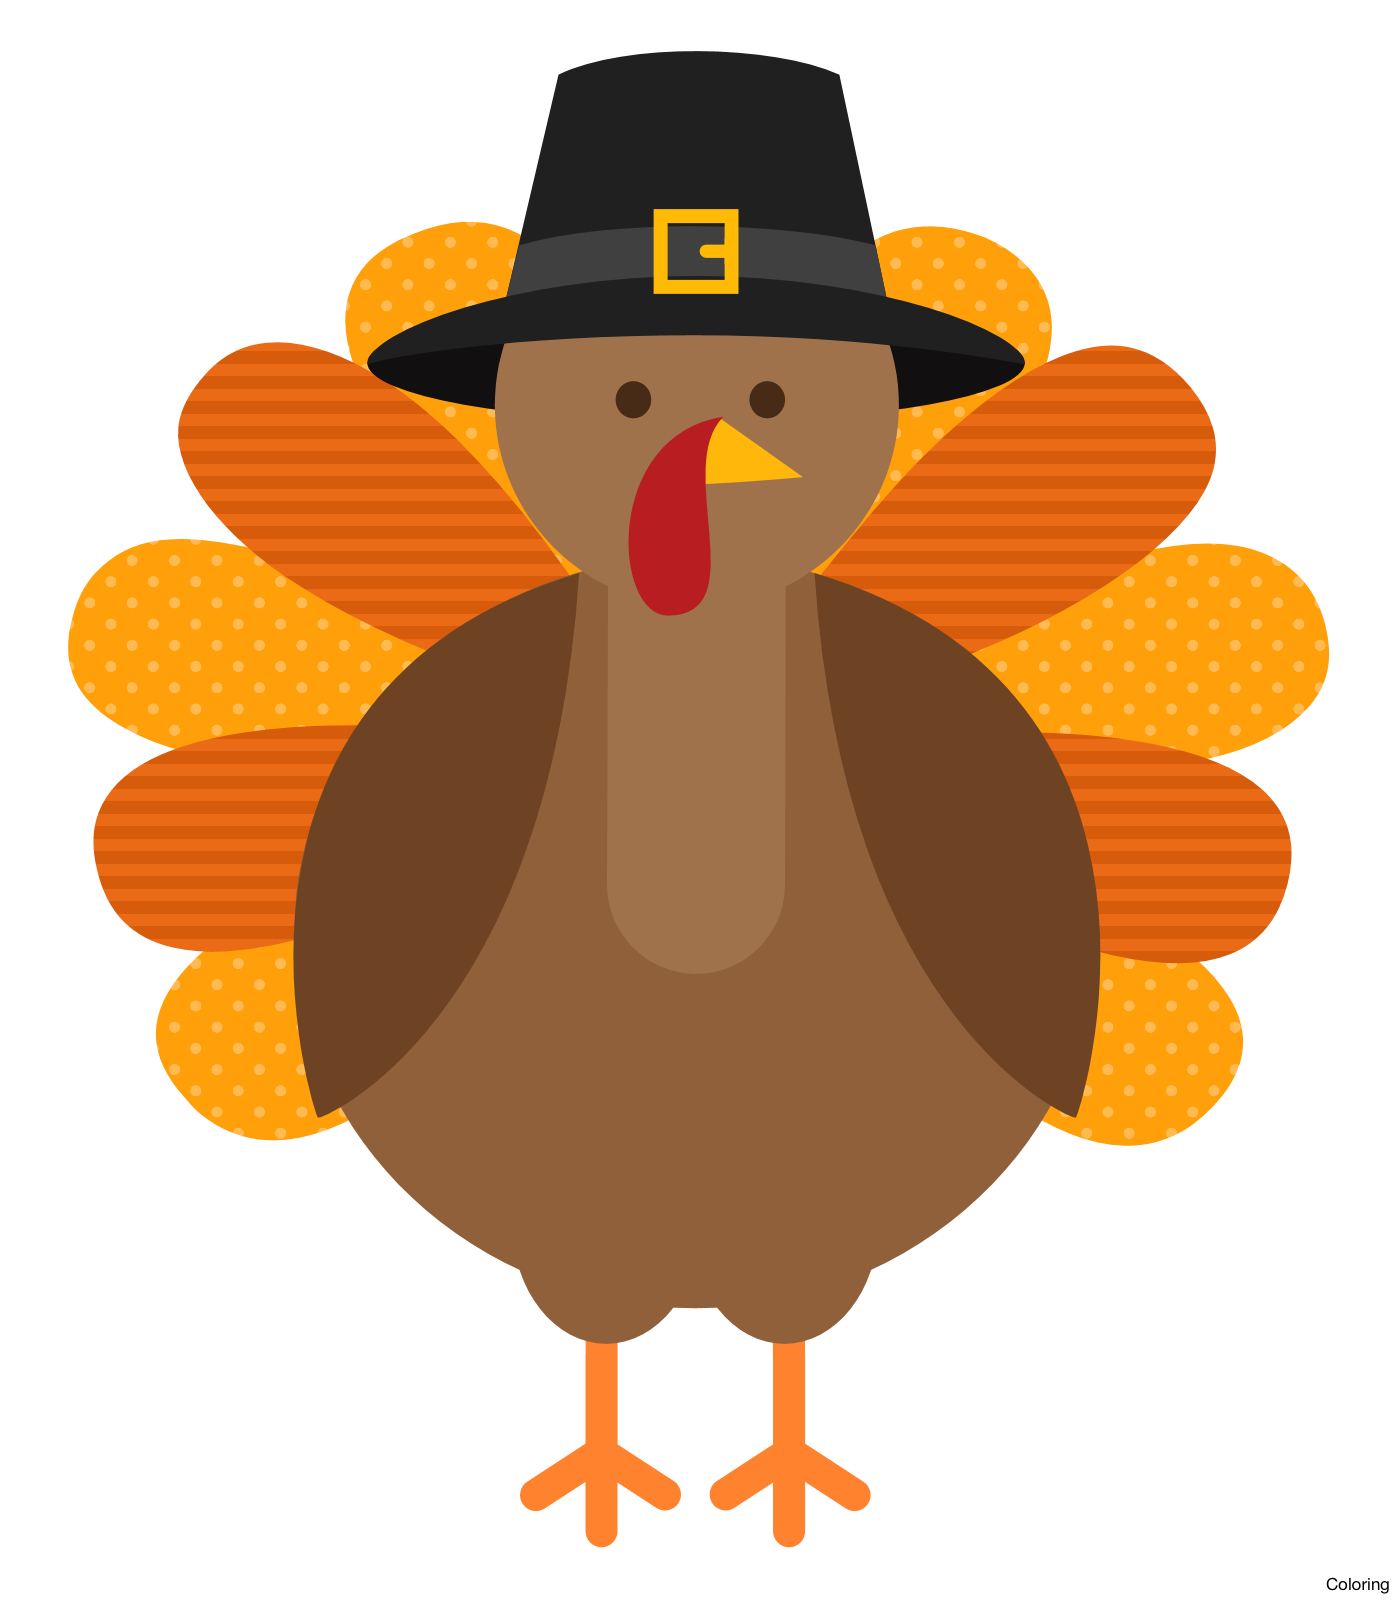 Clipart free turkey svg Animated Turkey Clipart - cilpart svg